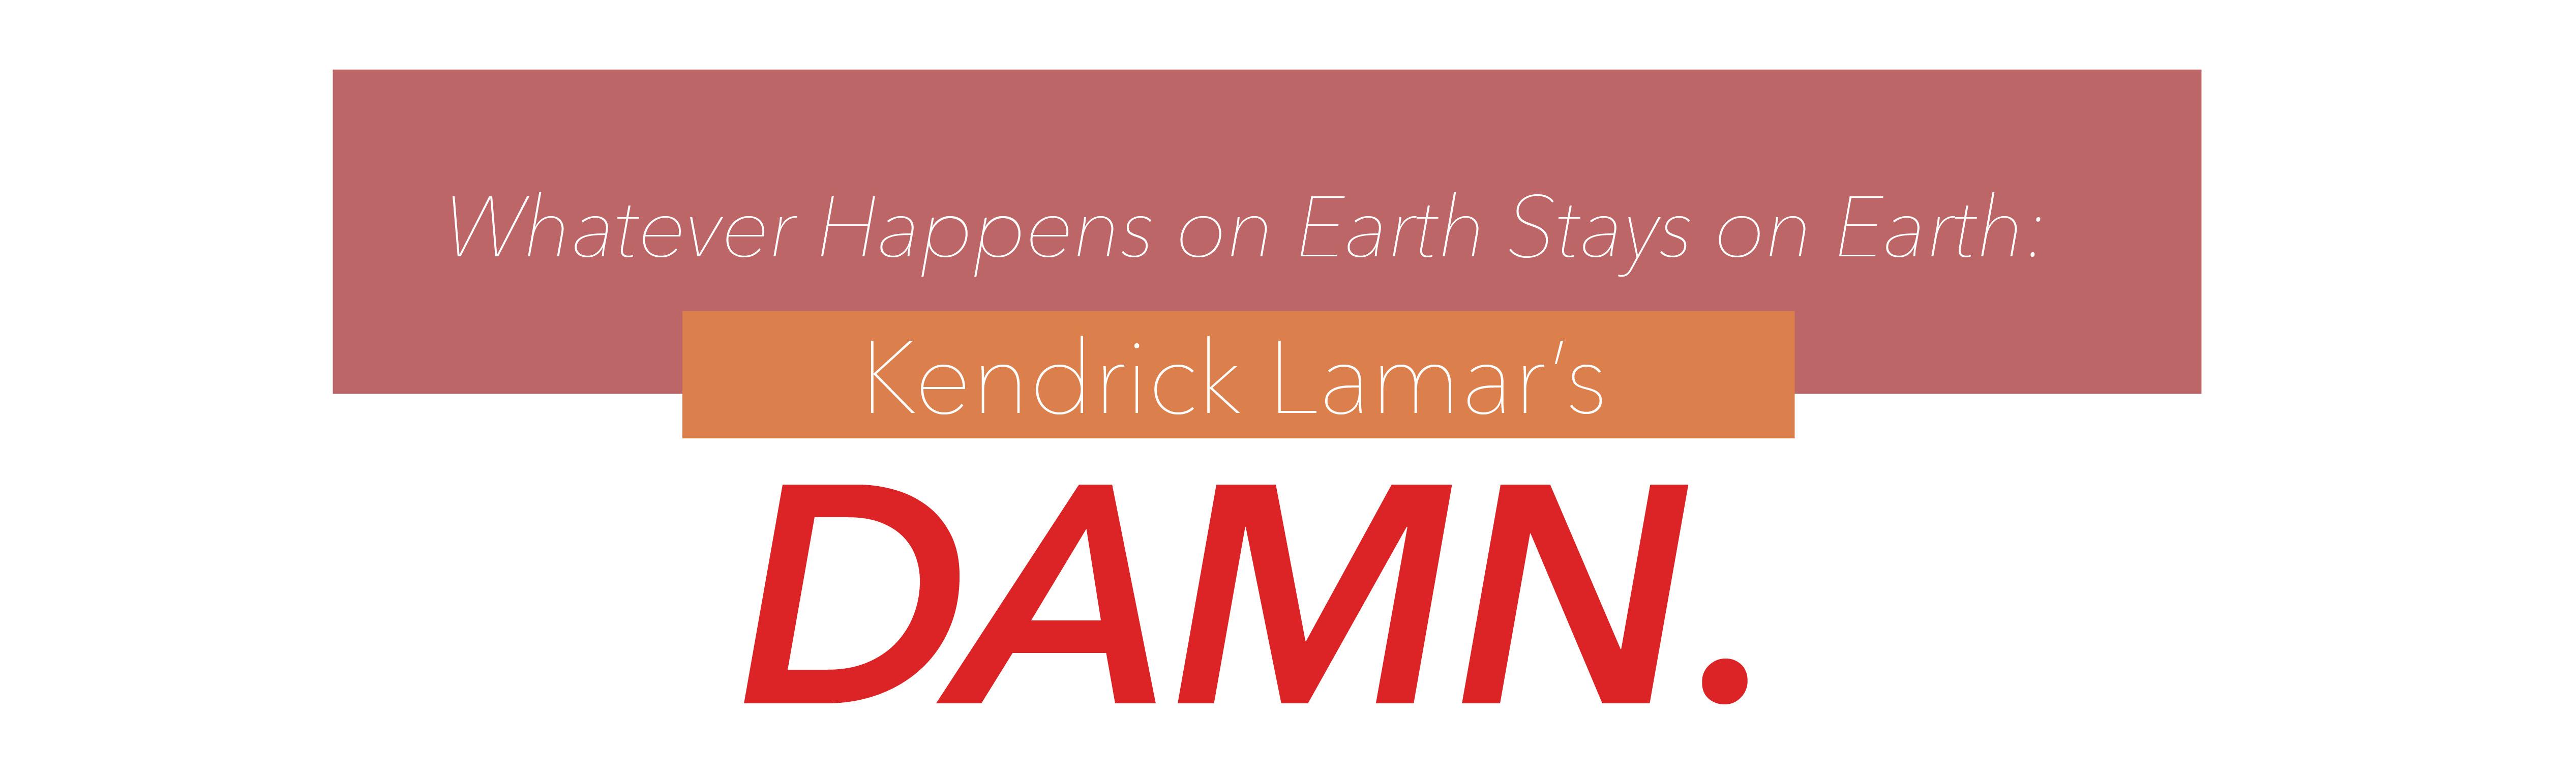 "Whatever Happens on Earth Stays on Earth: Kendrick Lamar's ""DAMN ..."